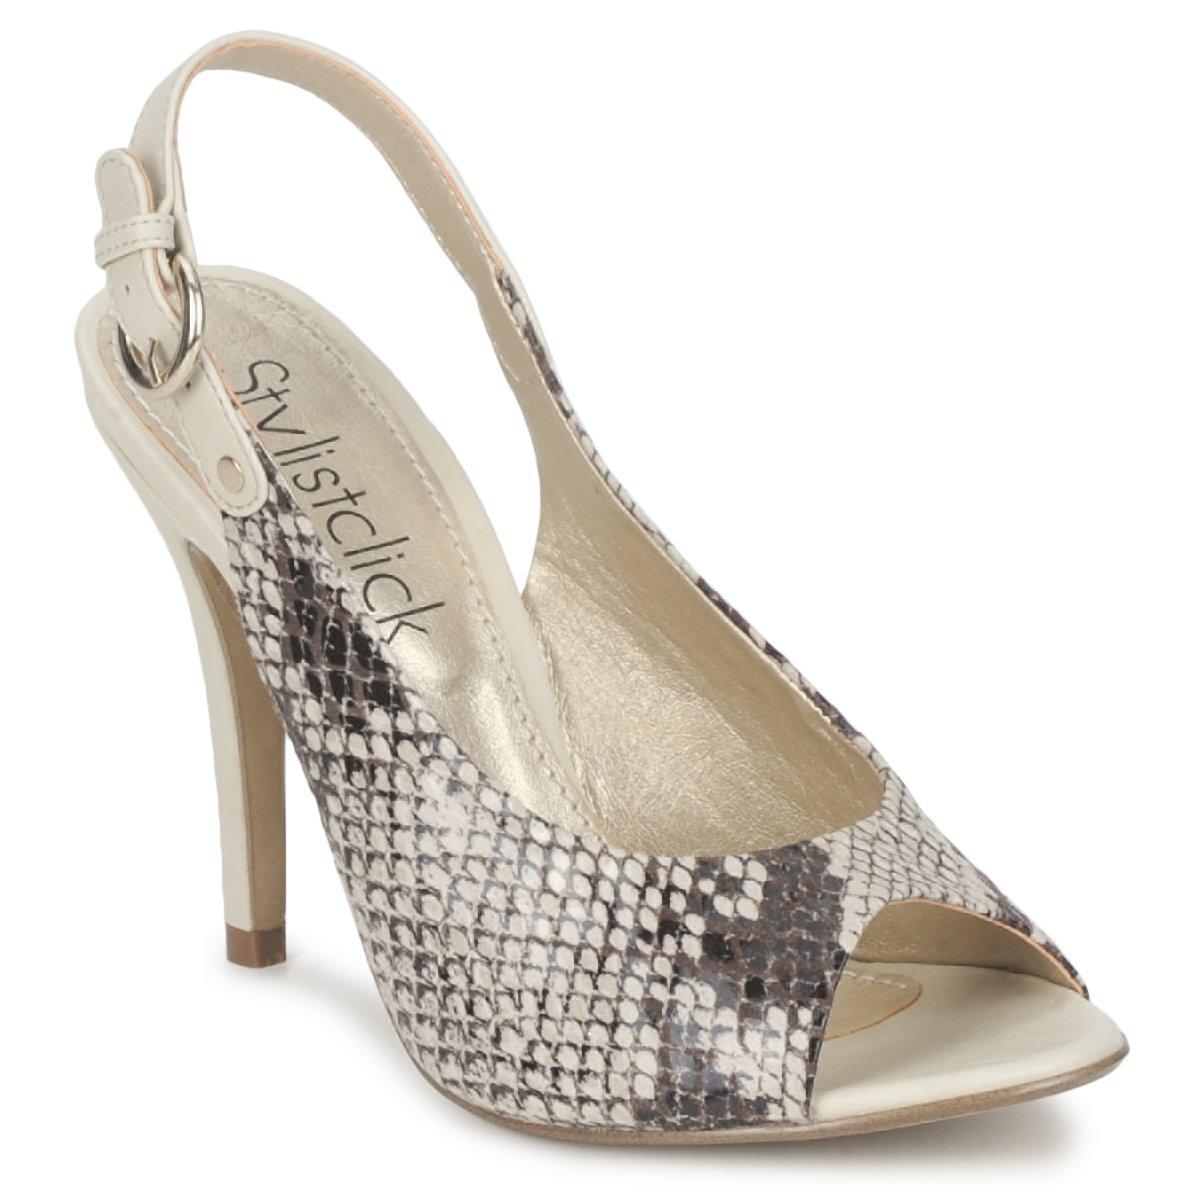 StylistClick RUTH Beige / Celadon - Kostenloser Versand bei Spartoode ! - Schuhe Sandalen / Sandaletten Damen 24,00 €